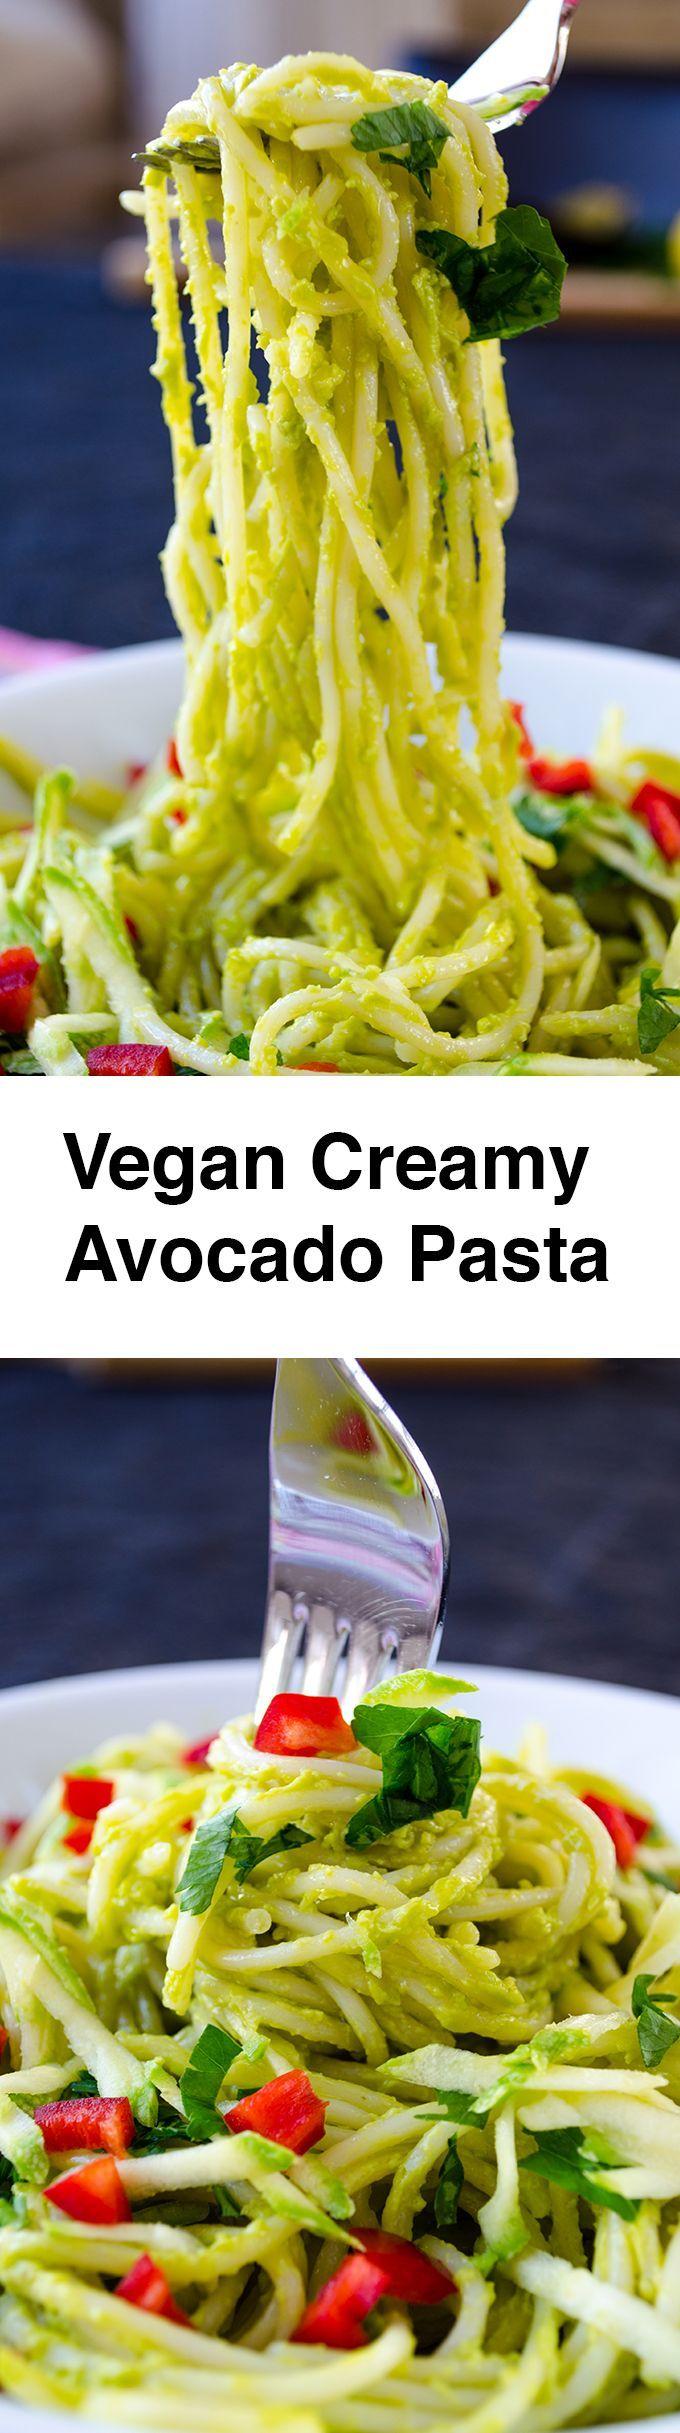 Vegan Creamy Avocado Pasta   Recipe   Avocado pasta, Creamy avocado ...